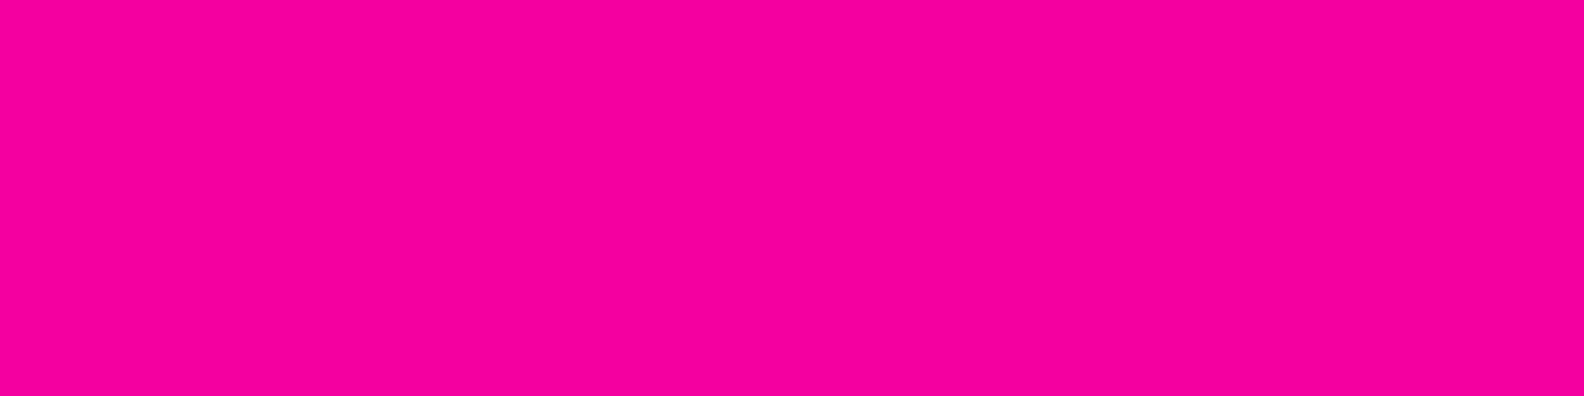 1584x396 Fashion Fuchsia Solid Color Background